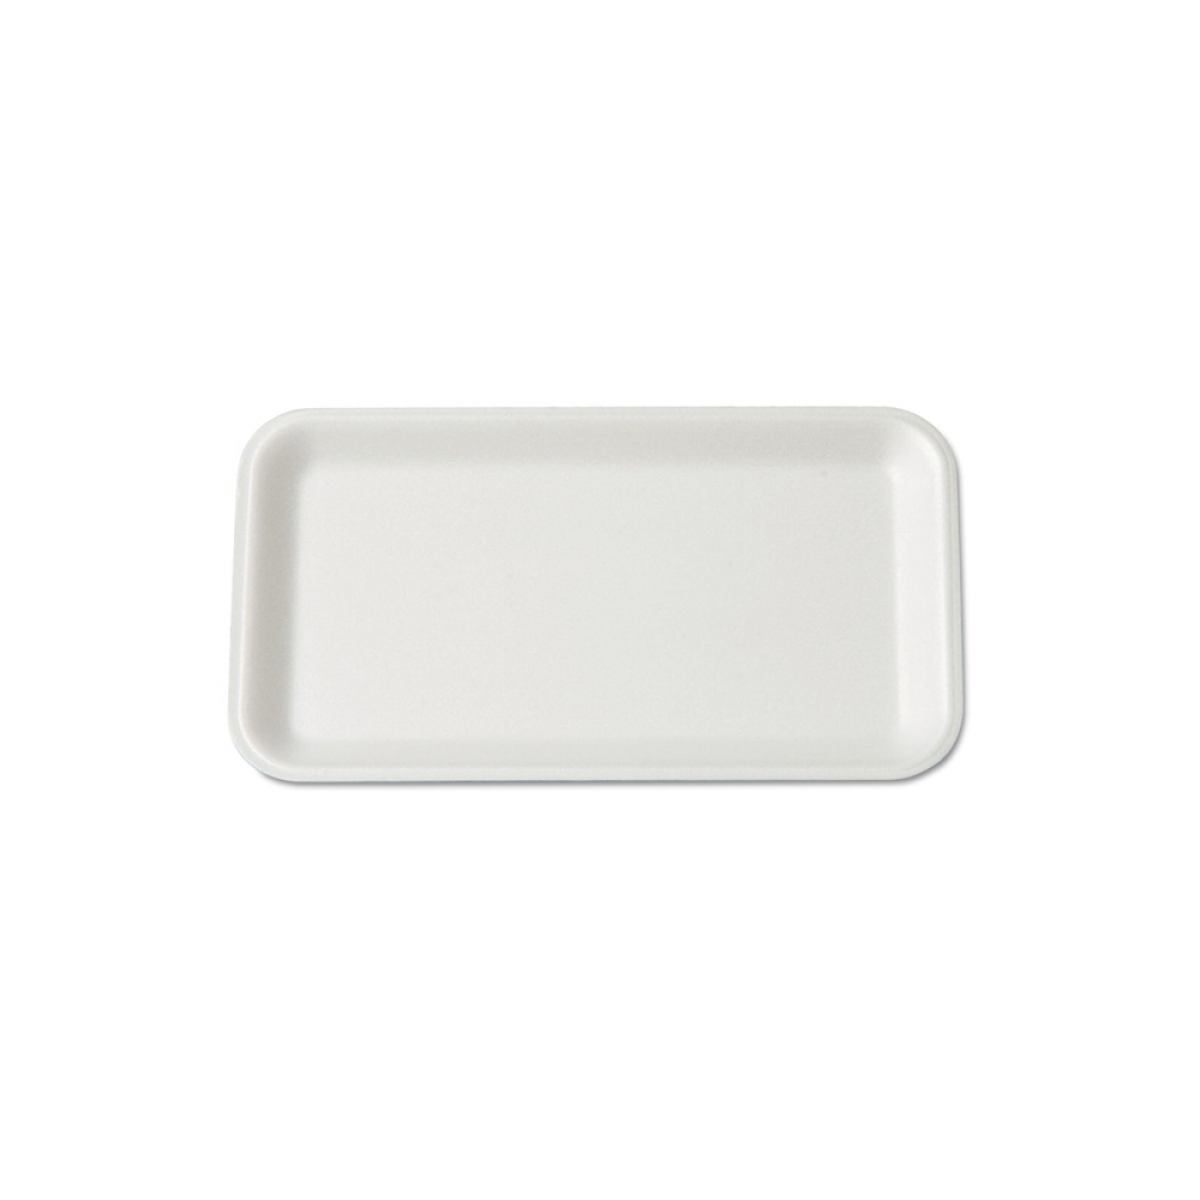 regtangular tray 230 cc / 162*120*23